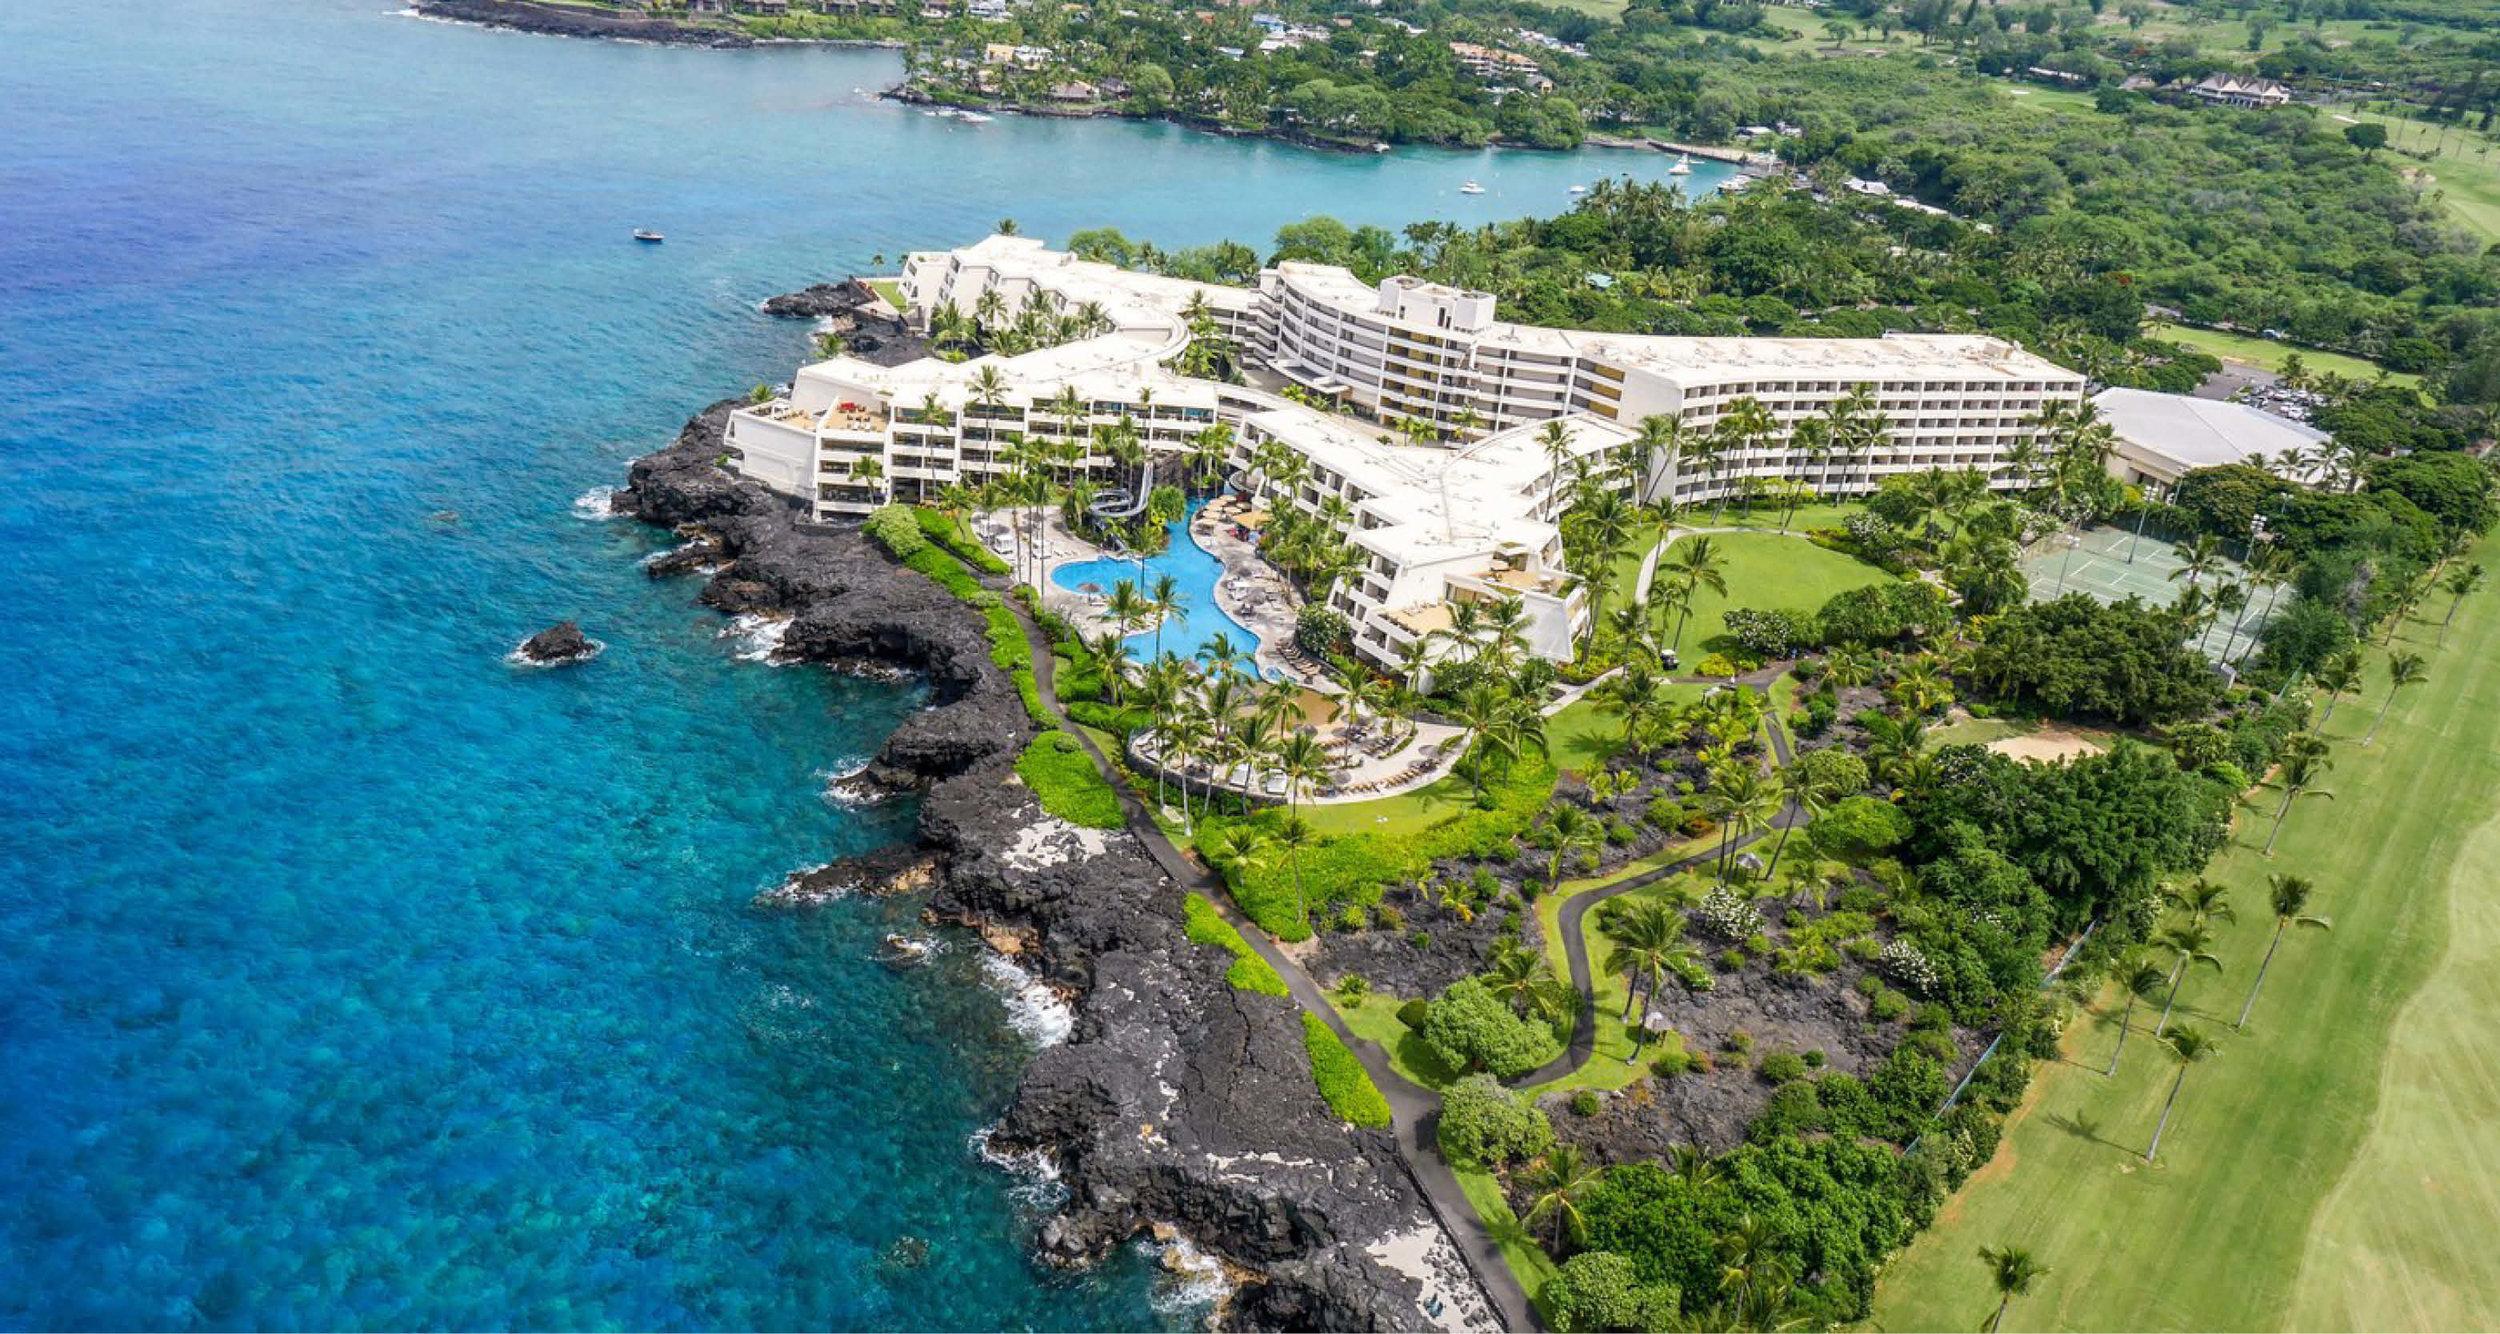 Dream-Maker-Travel-Accom-Hawaii-Sheraton-Aerial.jpg